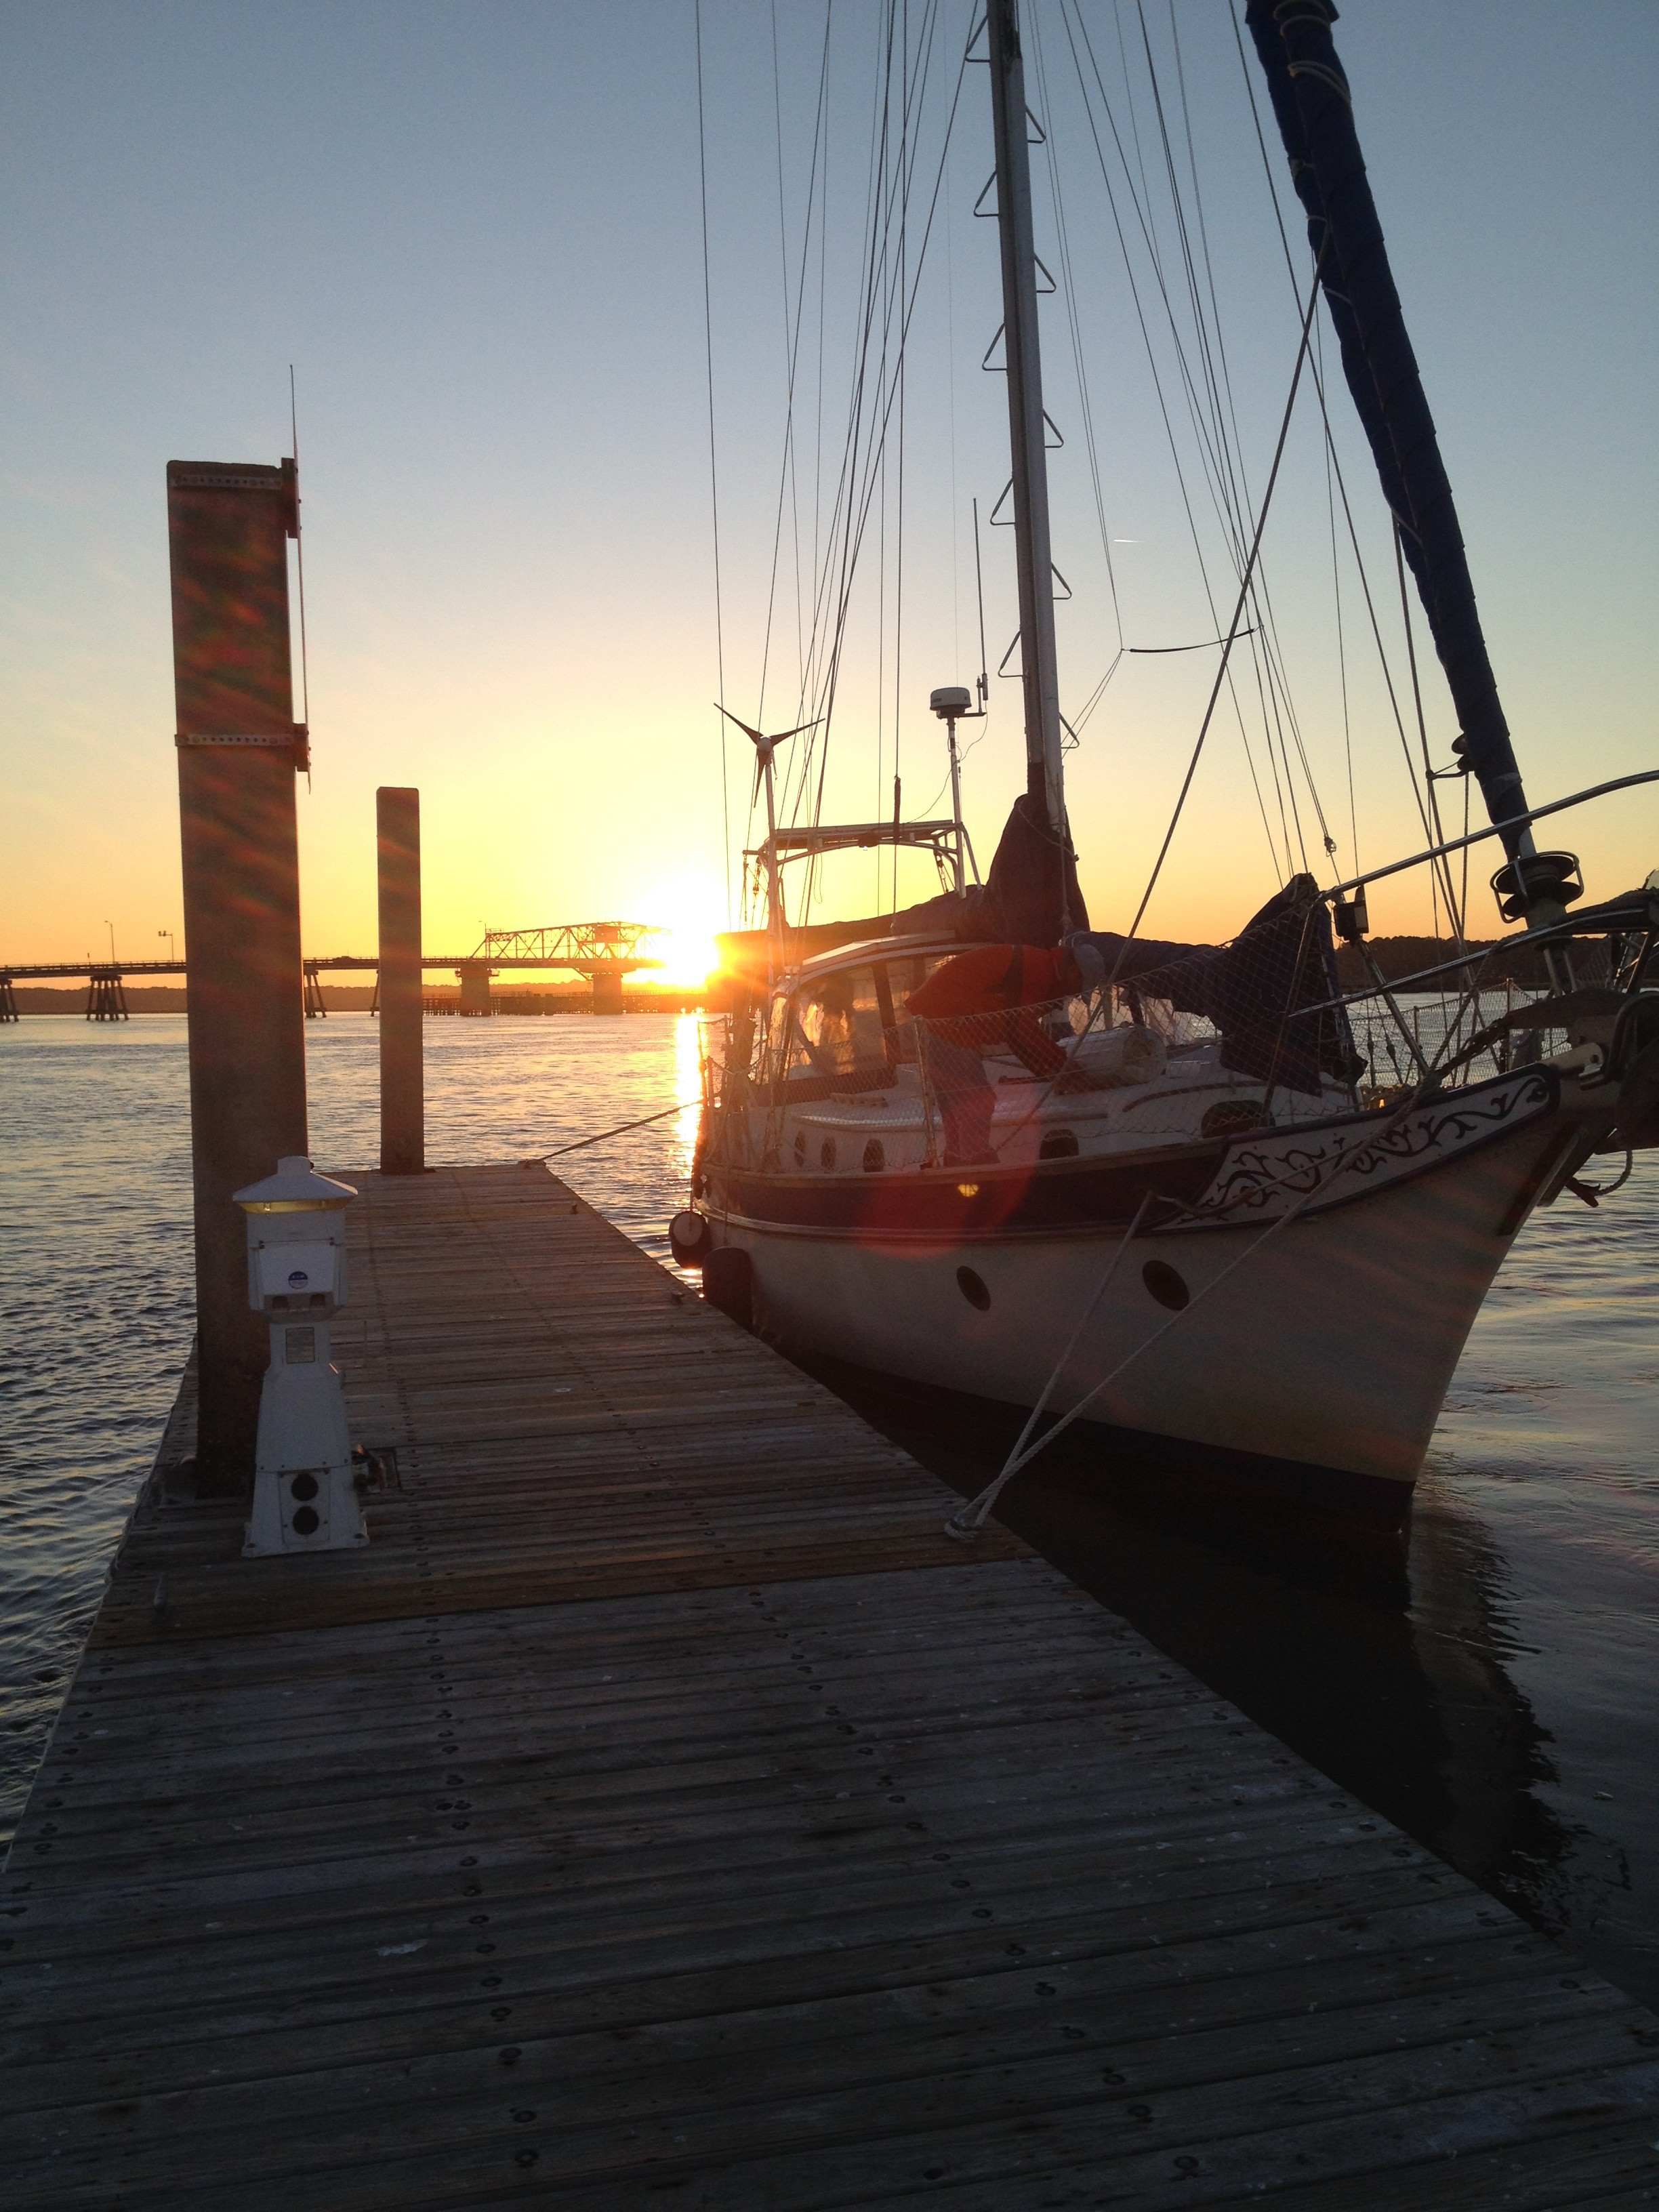 Beaufort, SC Sunrise